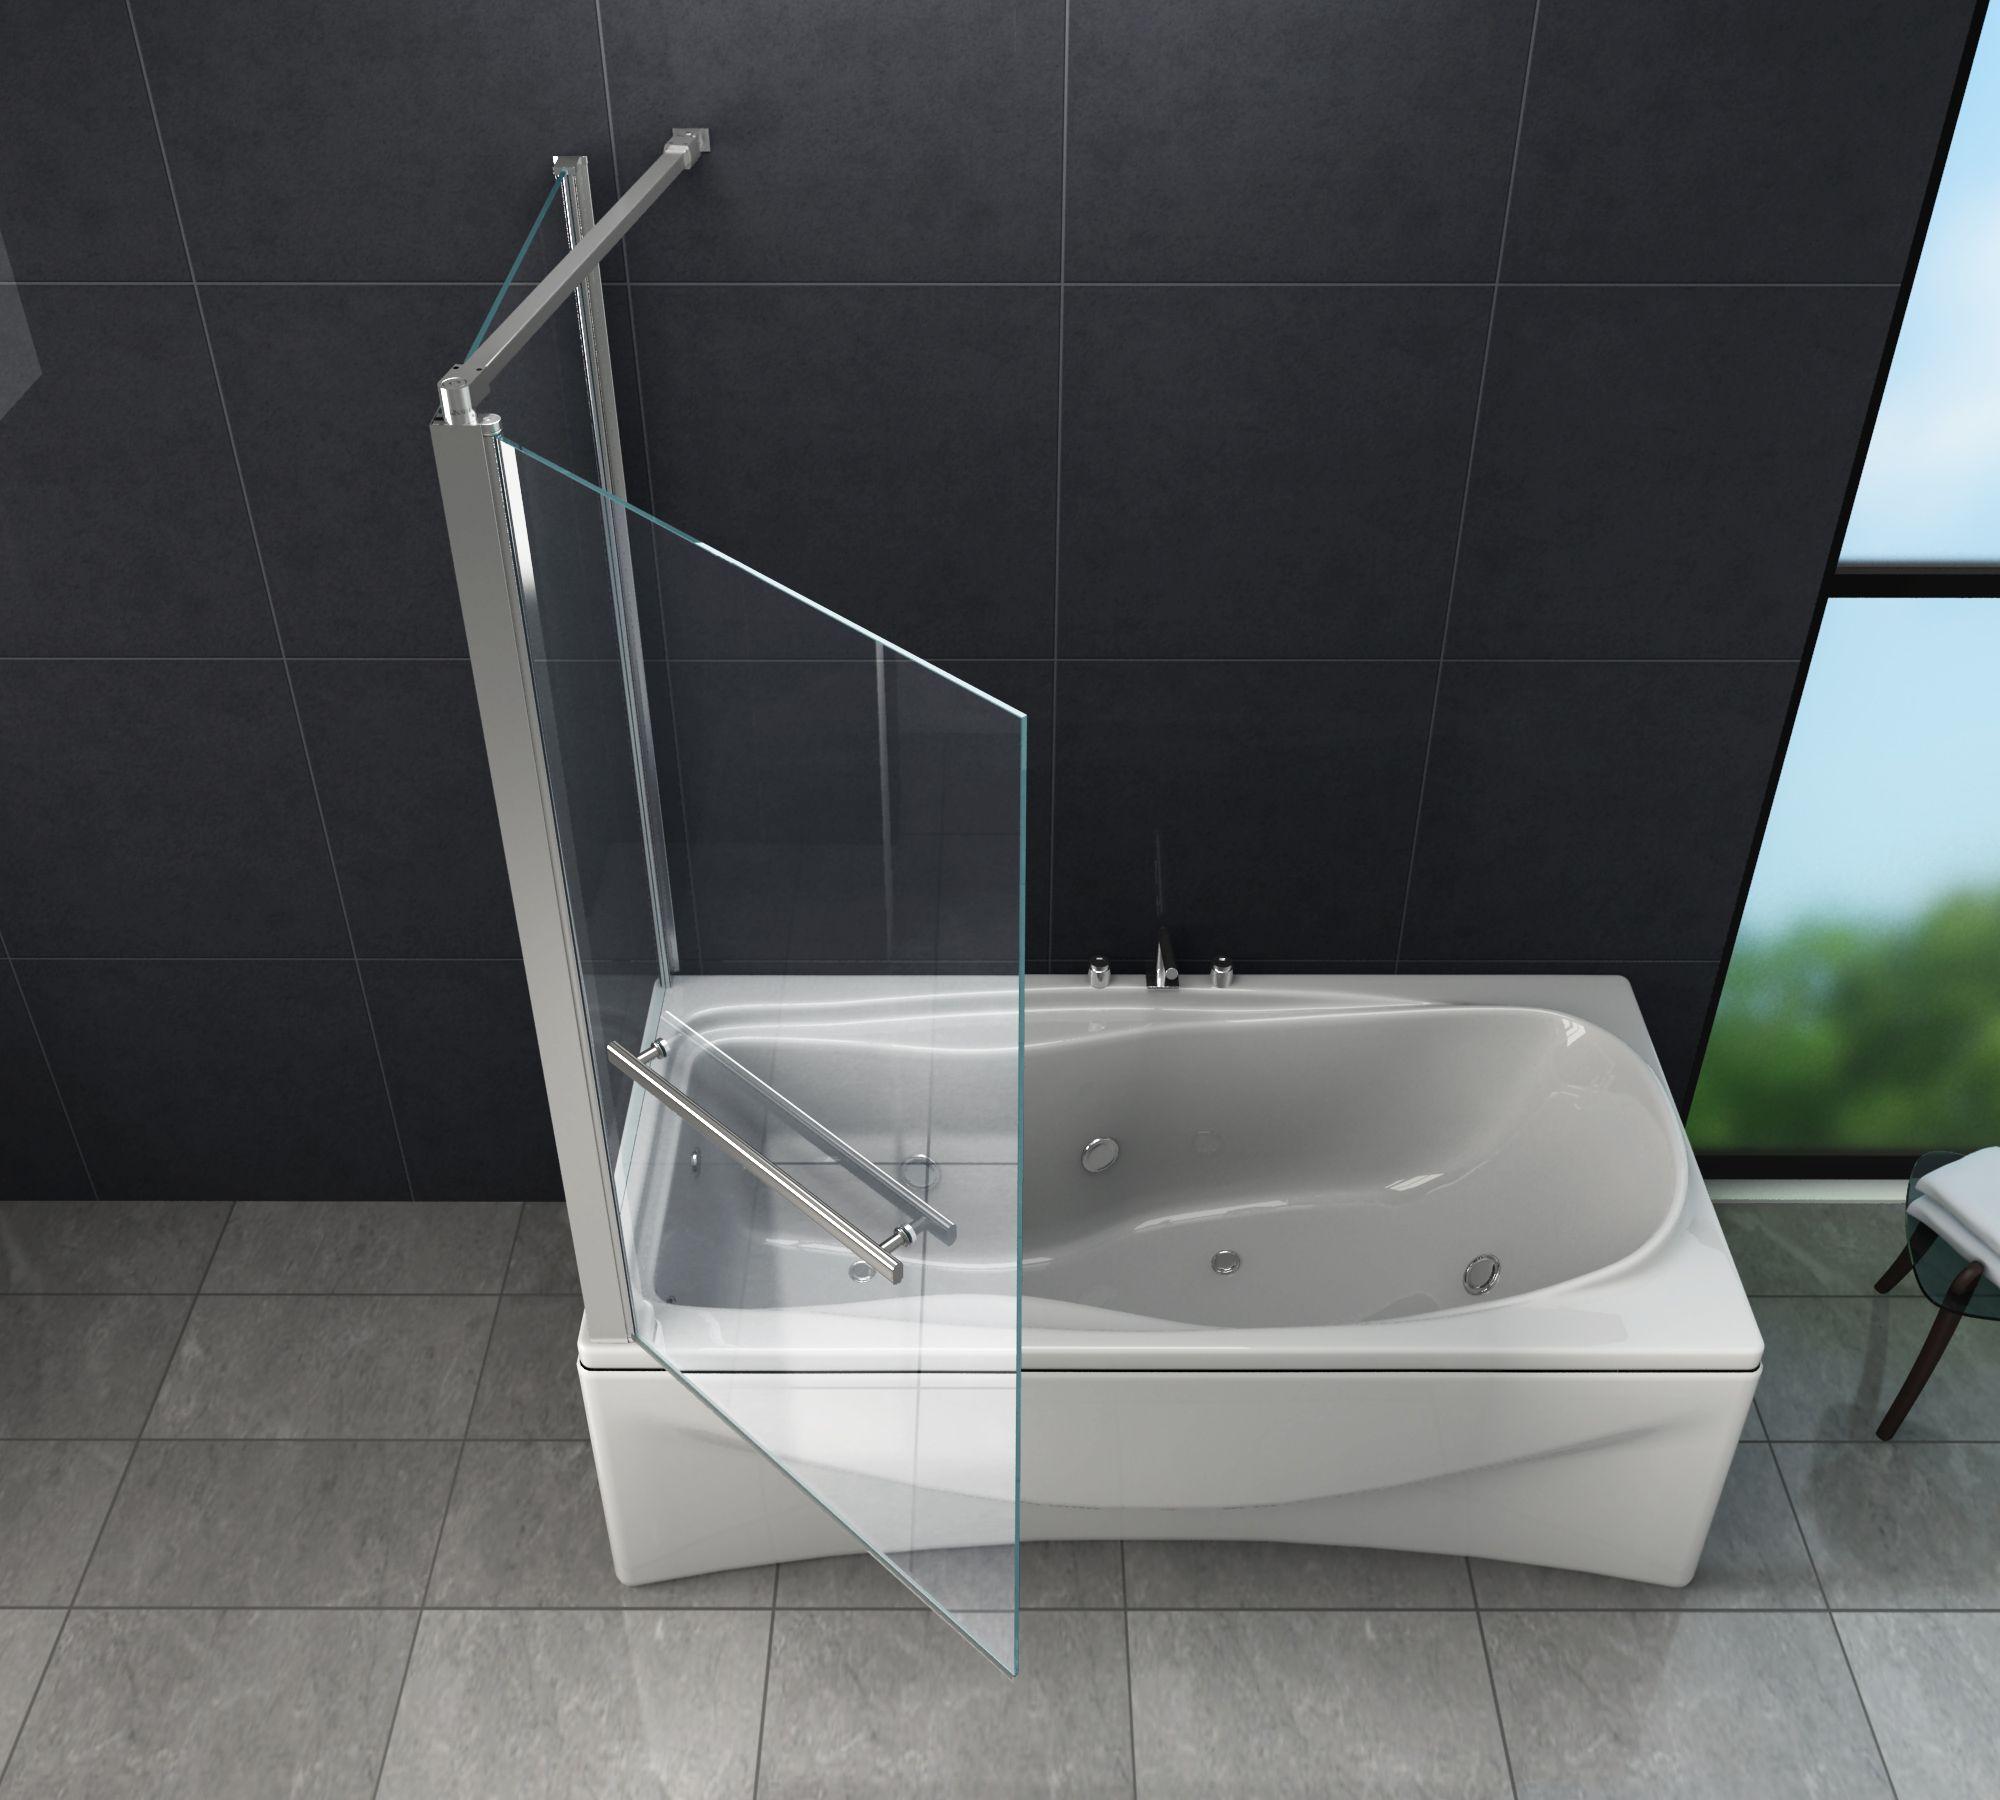 Eck Duschtrennwand Uniono Badewanne